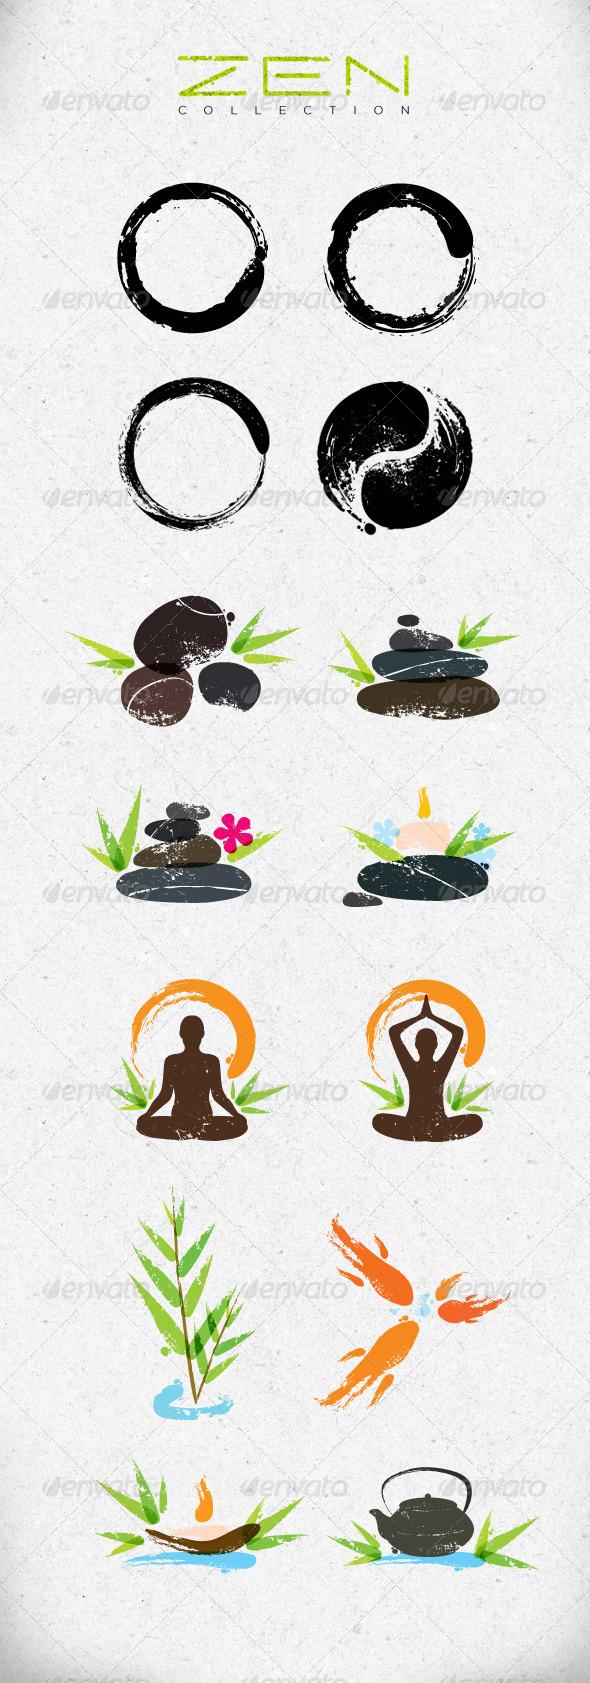 Zen Symbols Creative Vector Design Elements Set Graphicriver